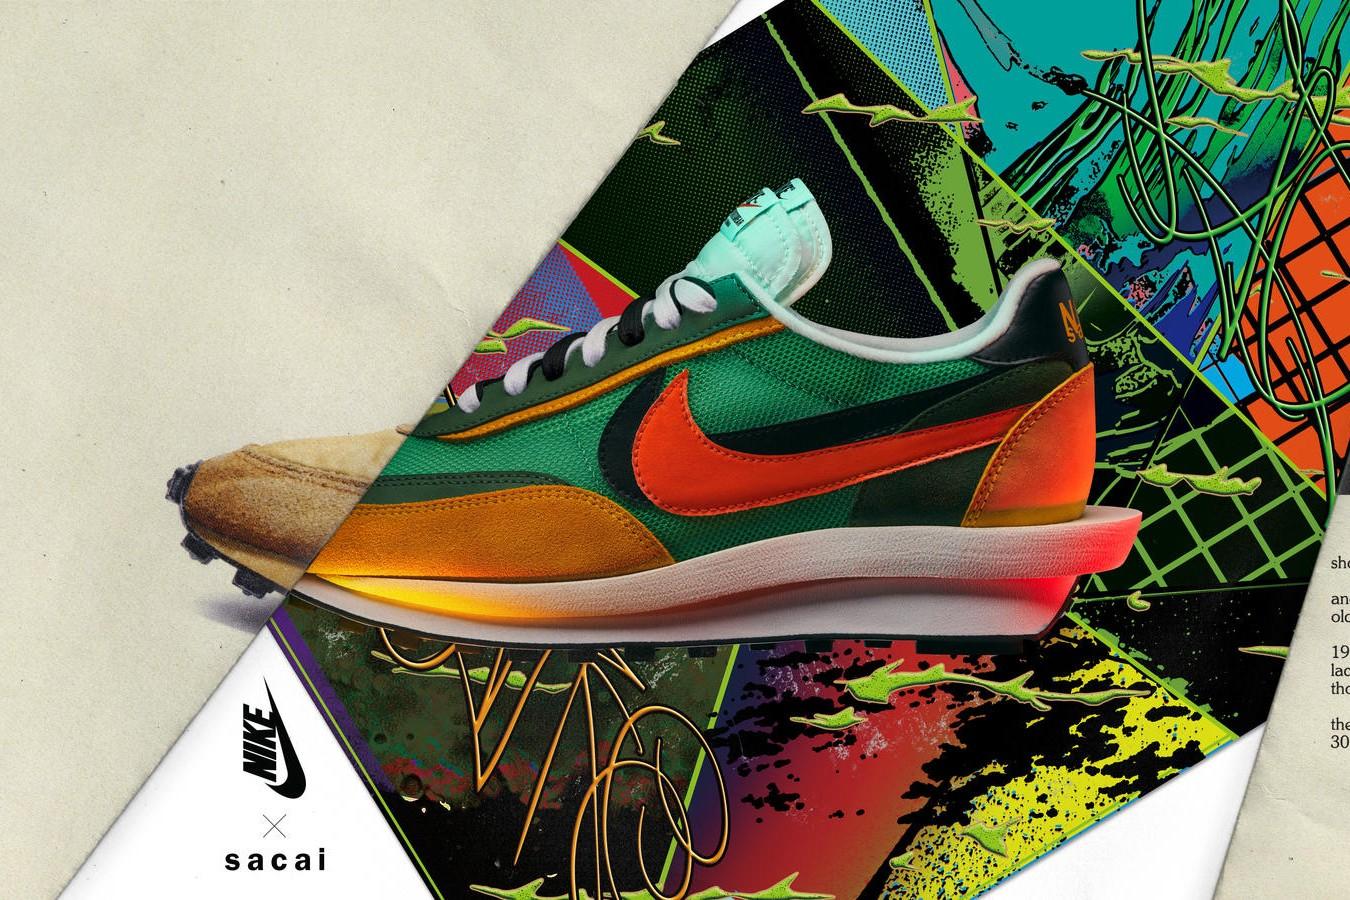 Où acheter les sneakers de la collaboration sacai x Nike